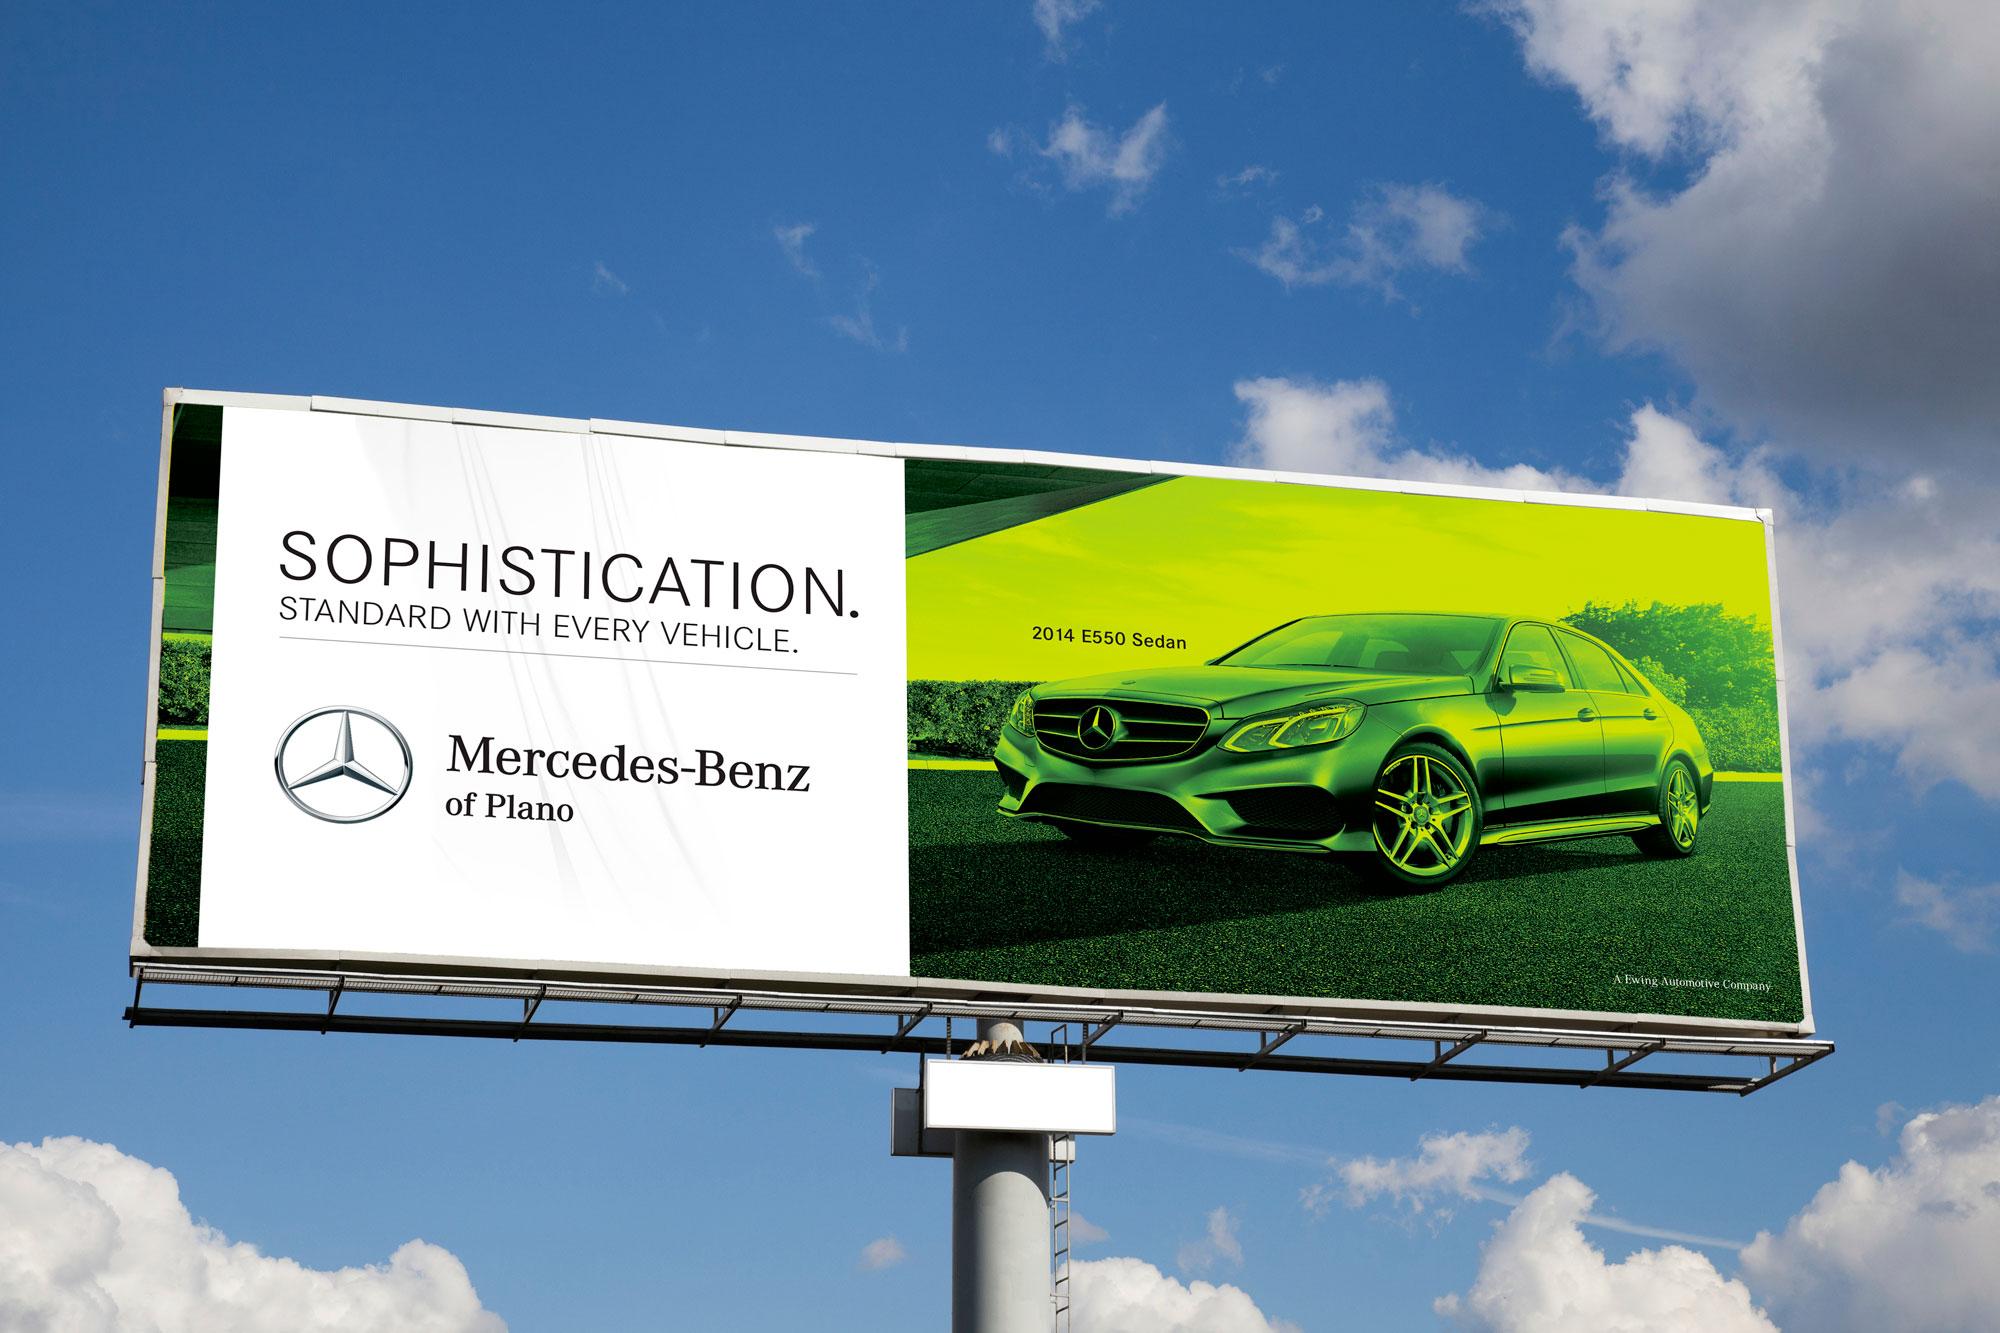 MBP_Billboard_sophistication.jpg